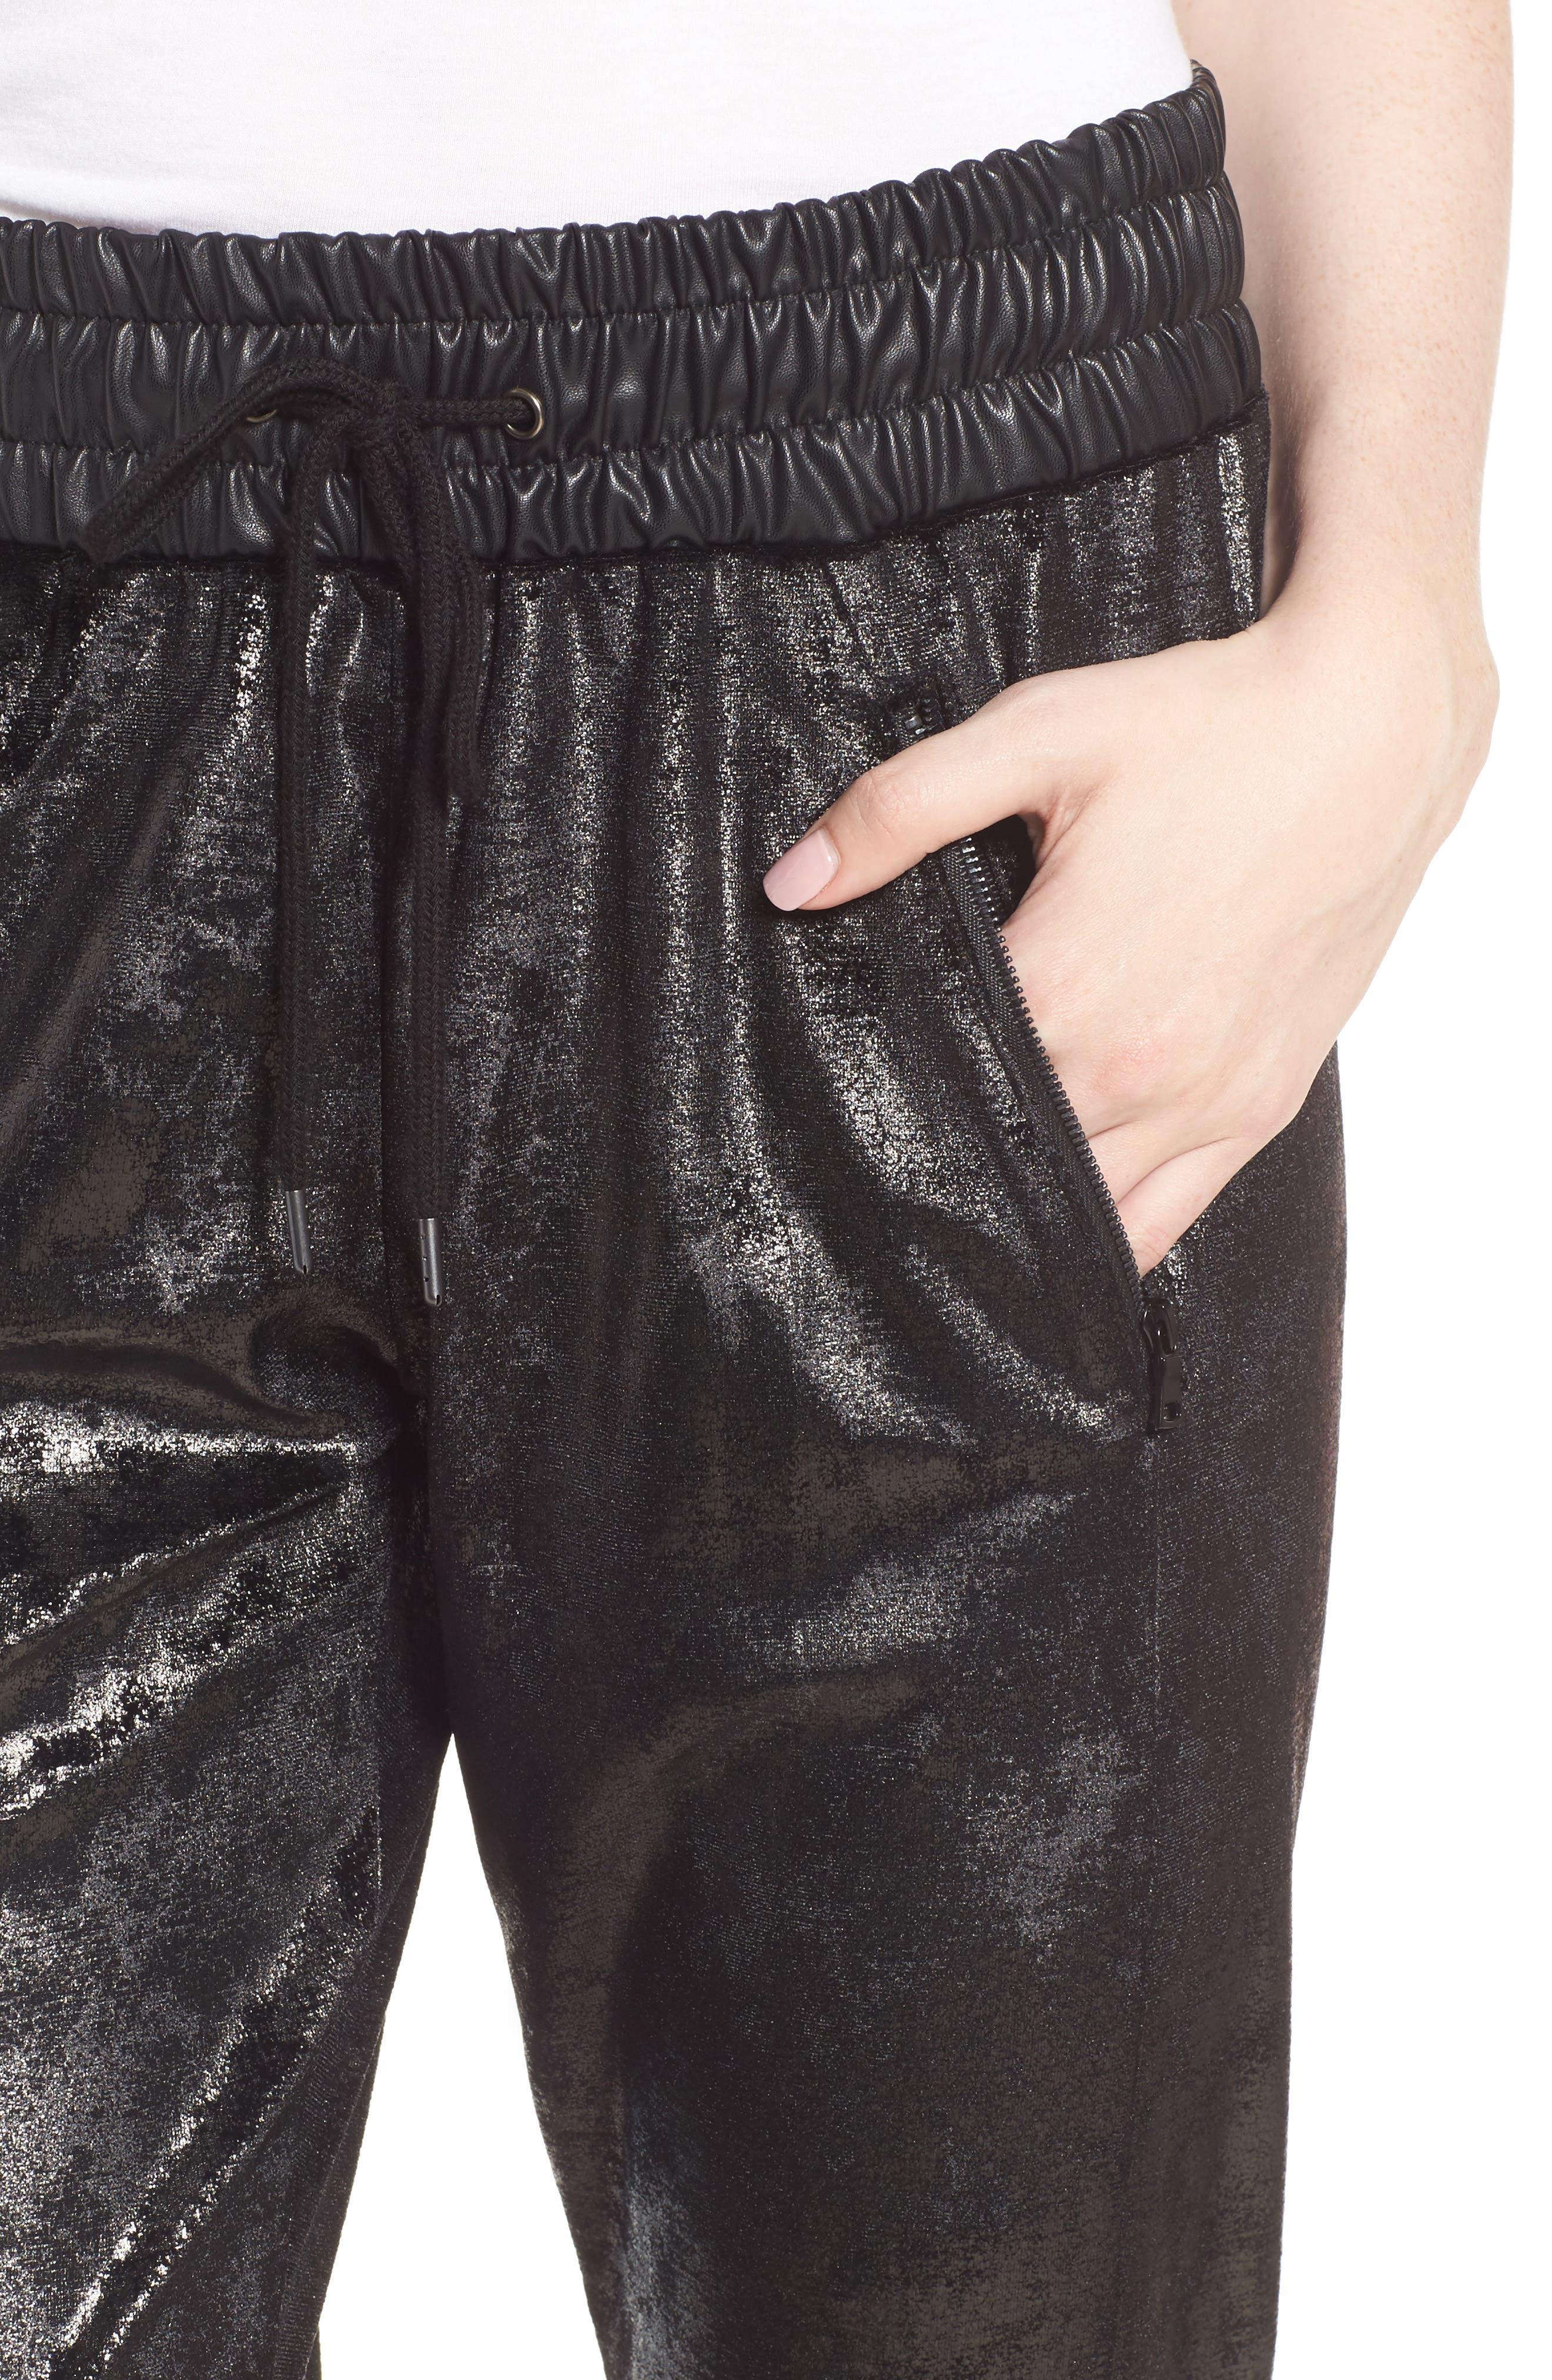 Randall Cuffed Sweatpants,                             Alternate thumbnail 4, color,                             Black